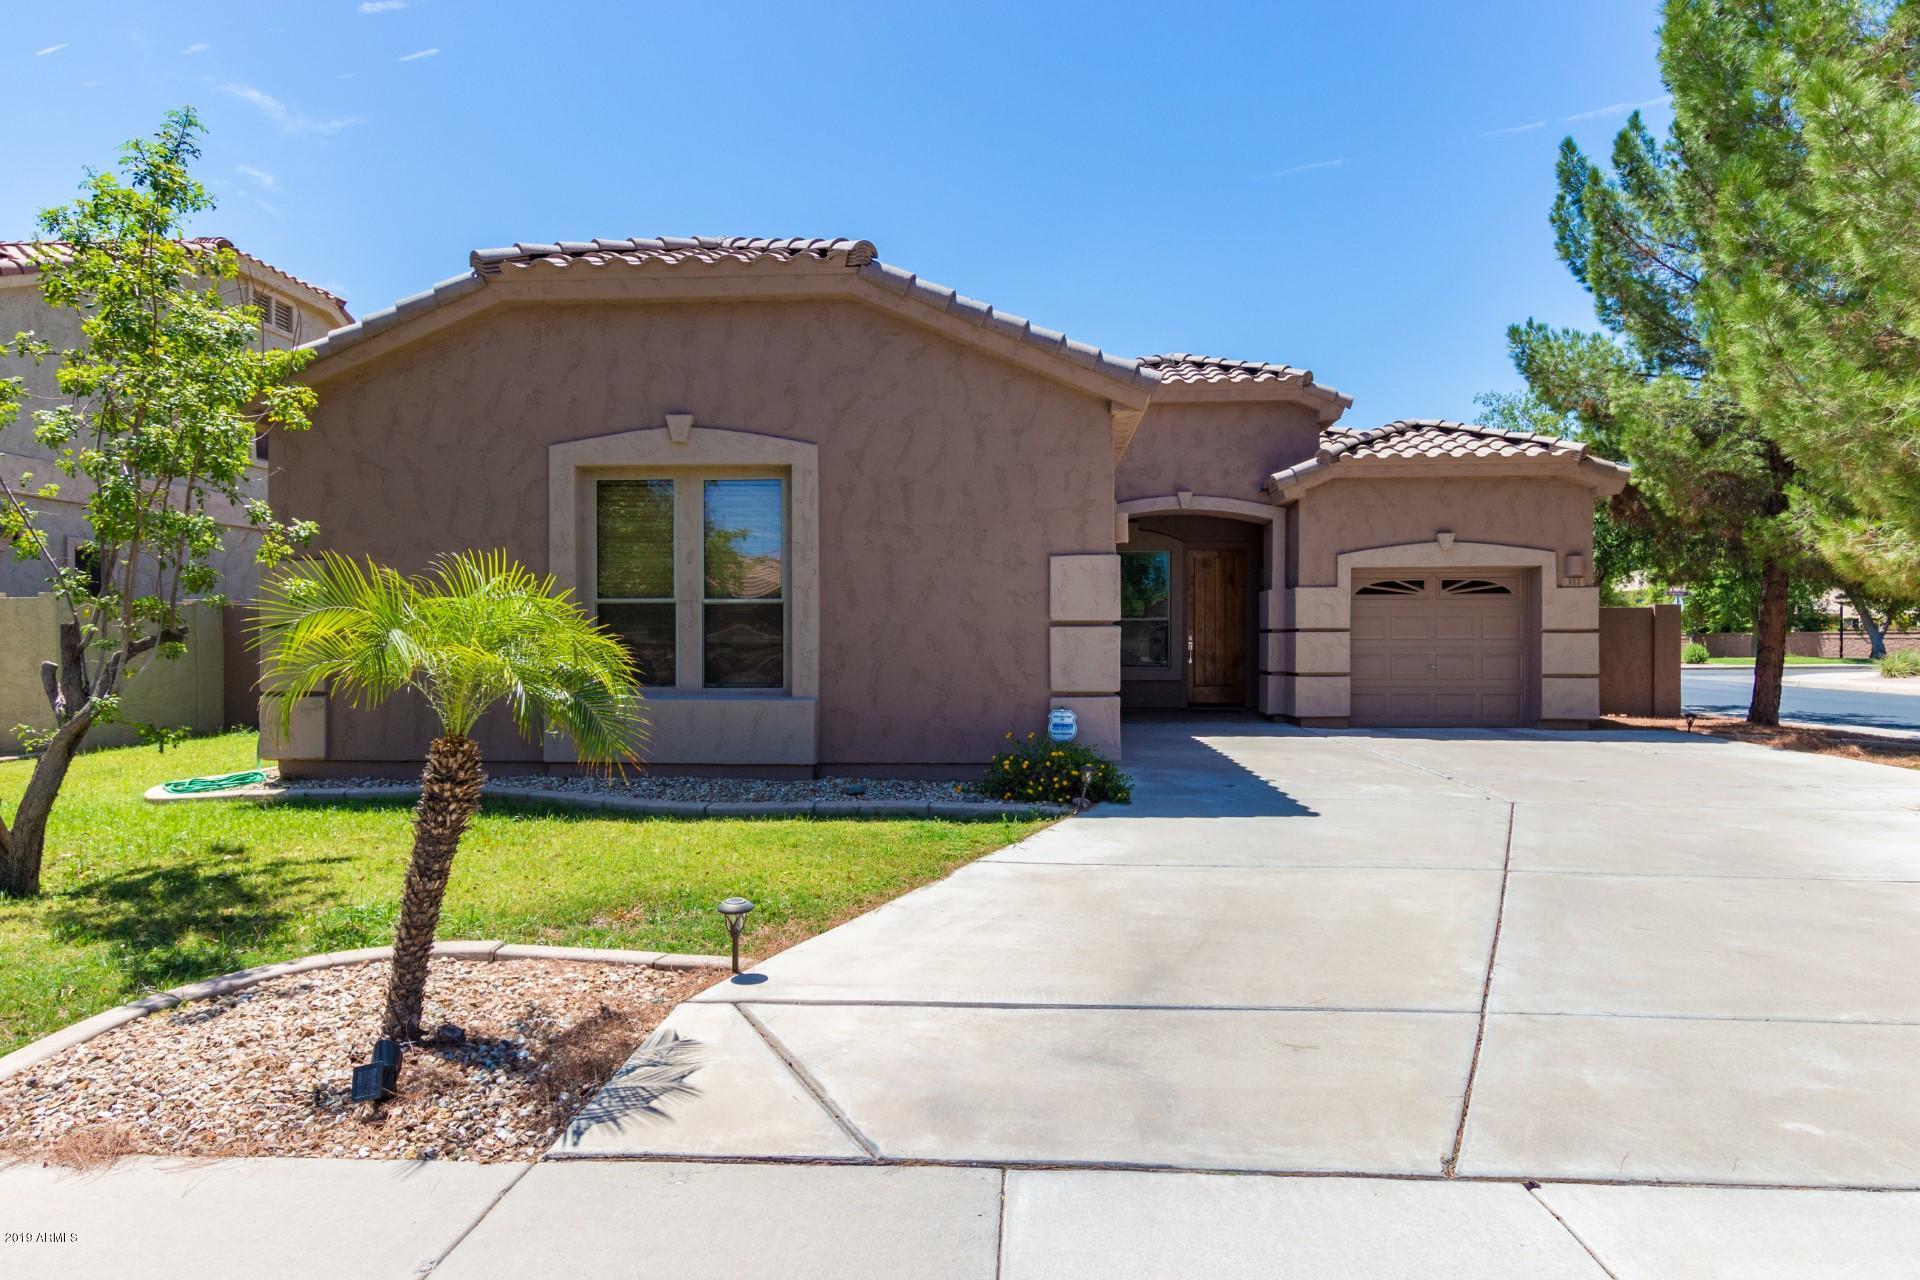 Photo of 311 W FLAMINGO Drive, Chandler, AZ 85286